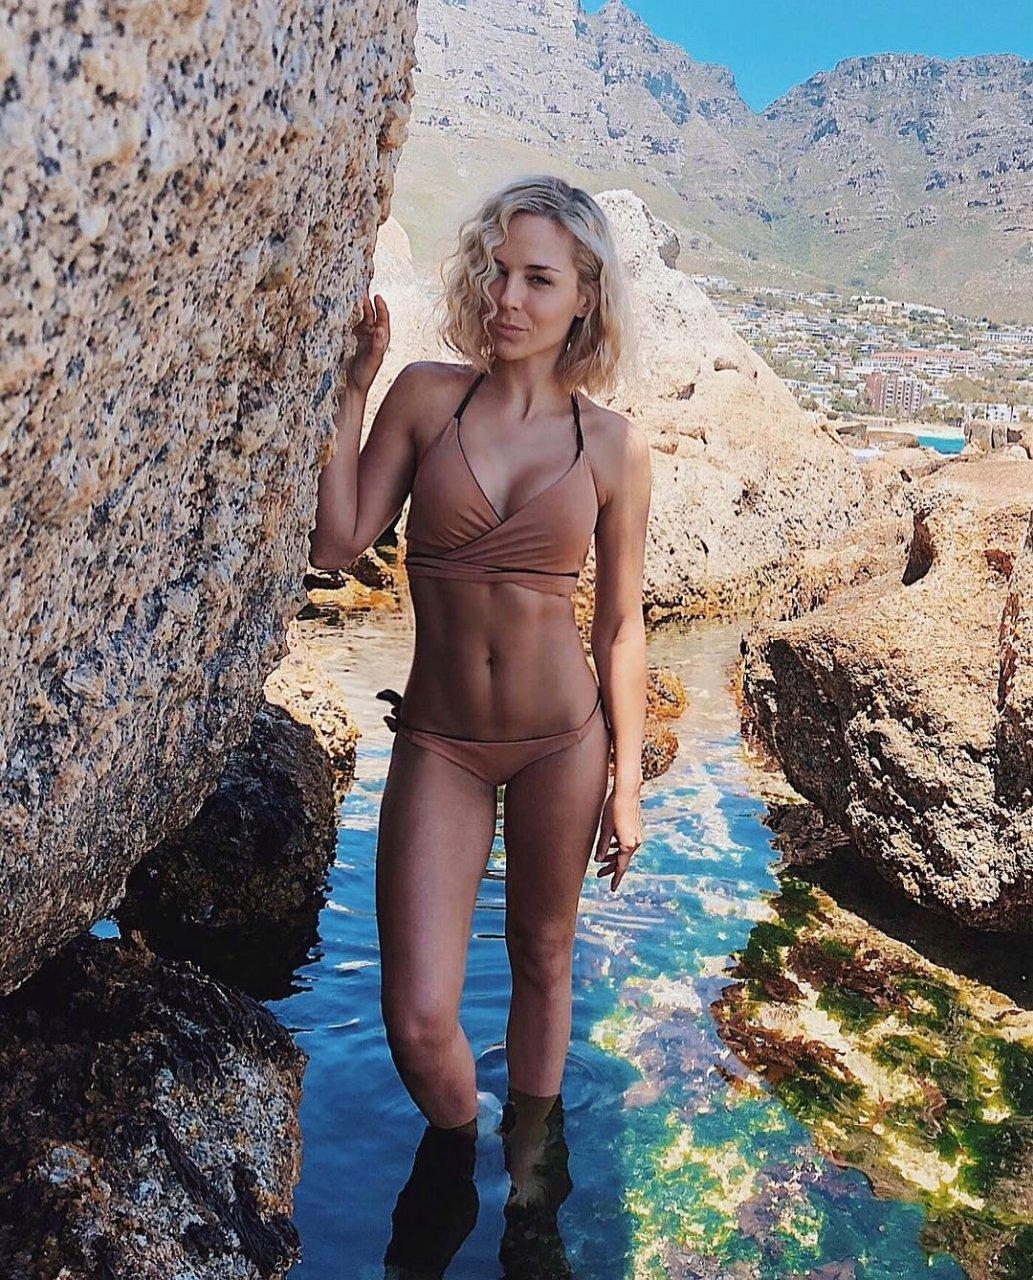 Watch Tanya van graan nude and sexy video